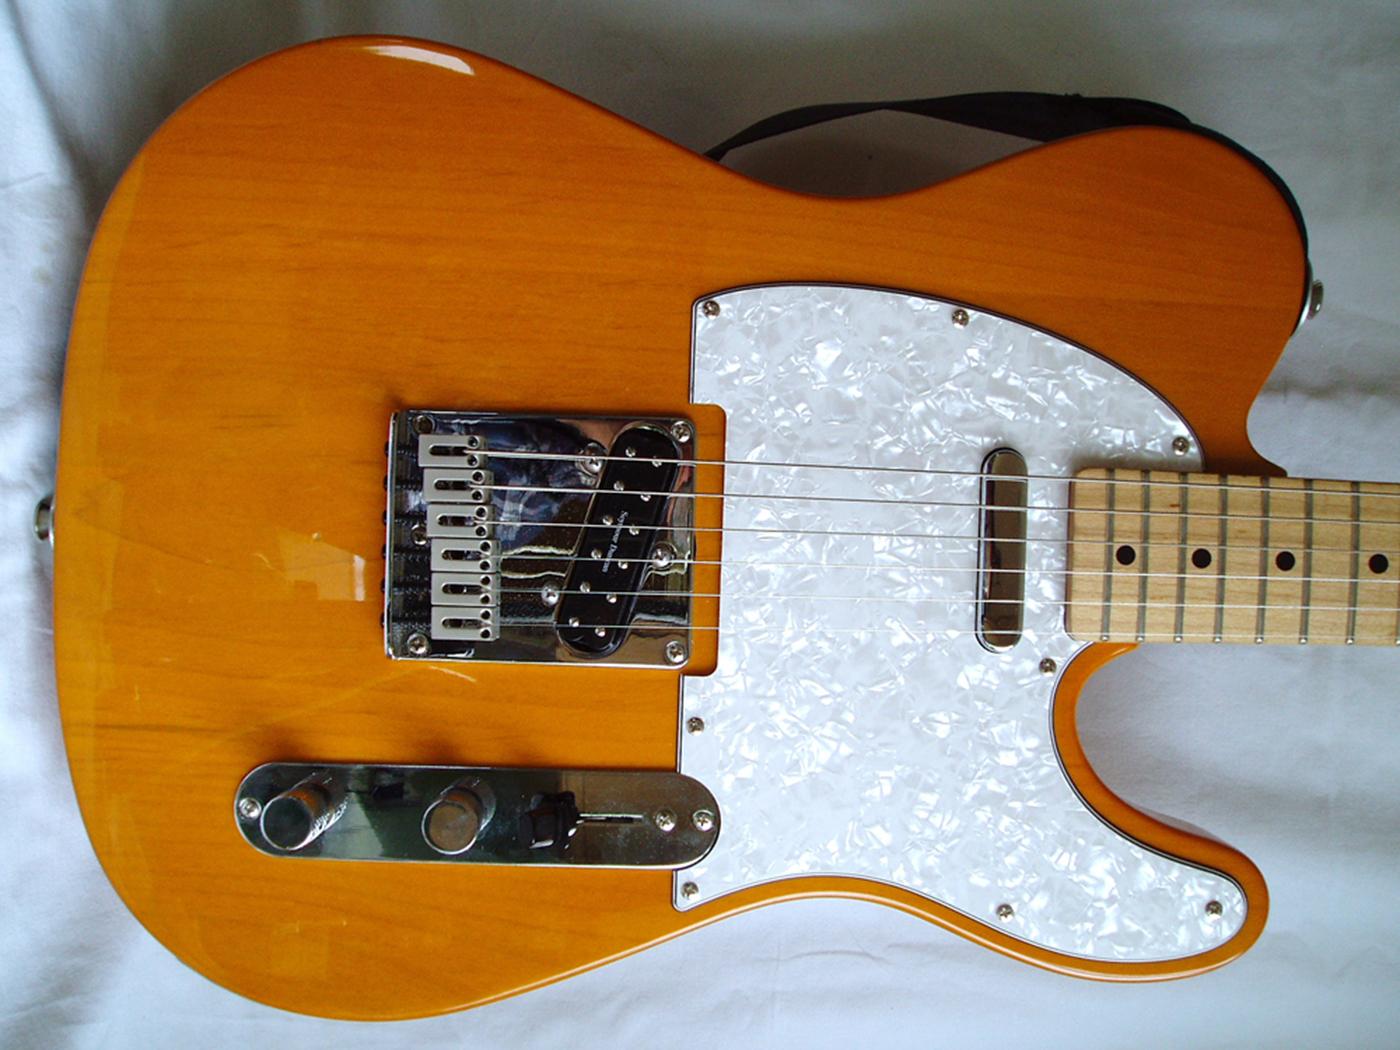 Diy Workshop Squier Telecaster Upgrades All Things Standard Wiring Guitar